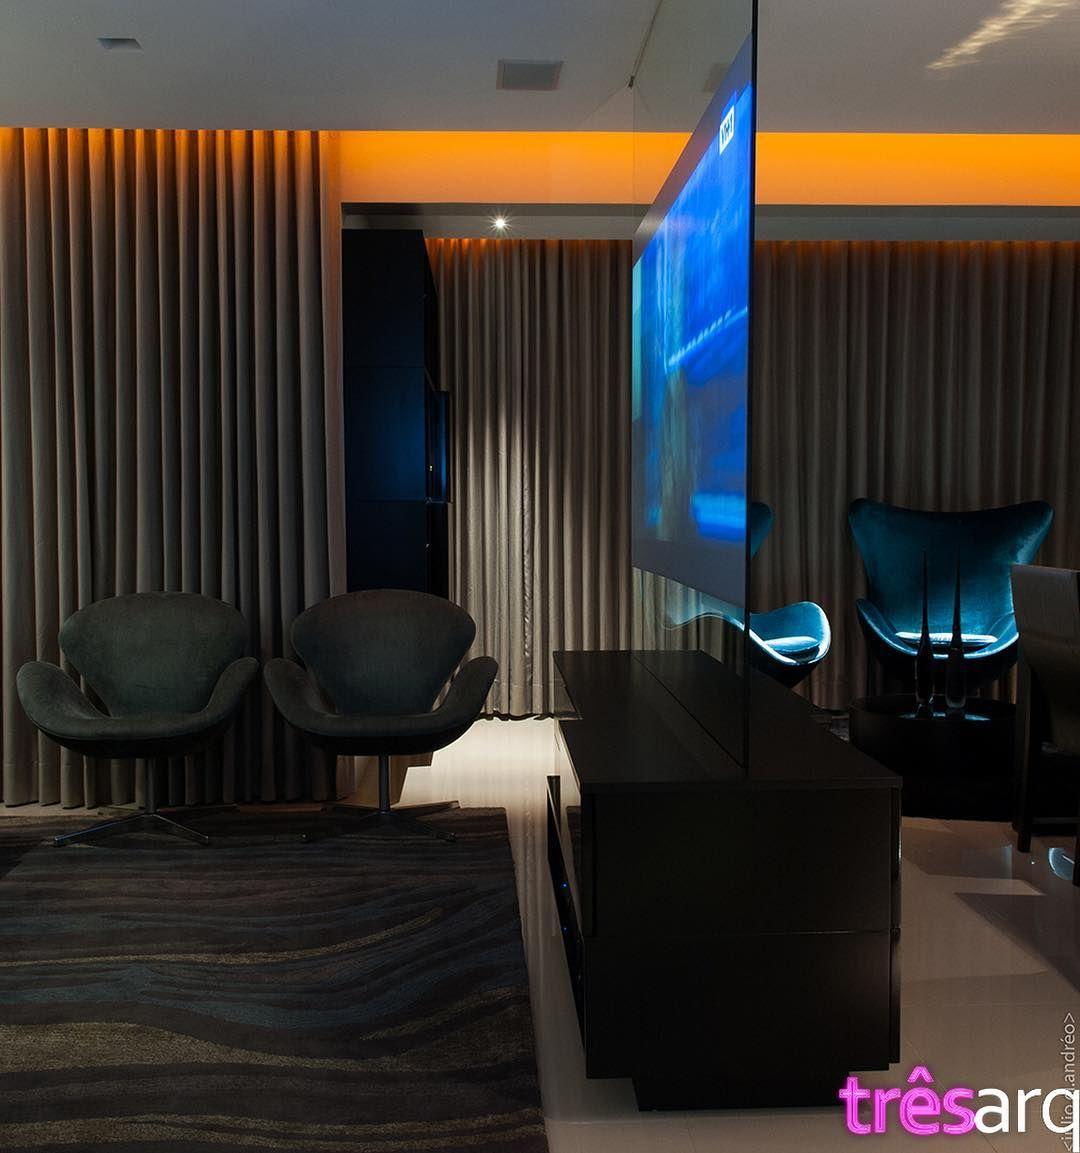 Projeção de vídeo no meio da sala? Sim! Num painel de vidro foto: @juliocla #tresarquitetura #interiordesign #achitecture #arquitetura #design #homestyle #decor #instadecor #instaarchitecture #instanew #livingroom #home #homedecor #homedecoration #instagood #instacool #brazil #brasil #modern #brasilia #luxury